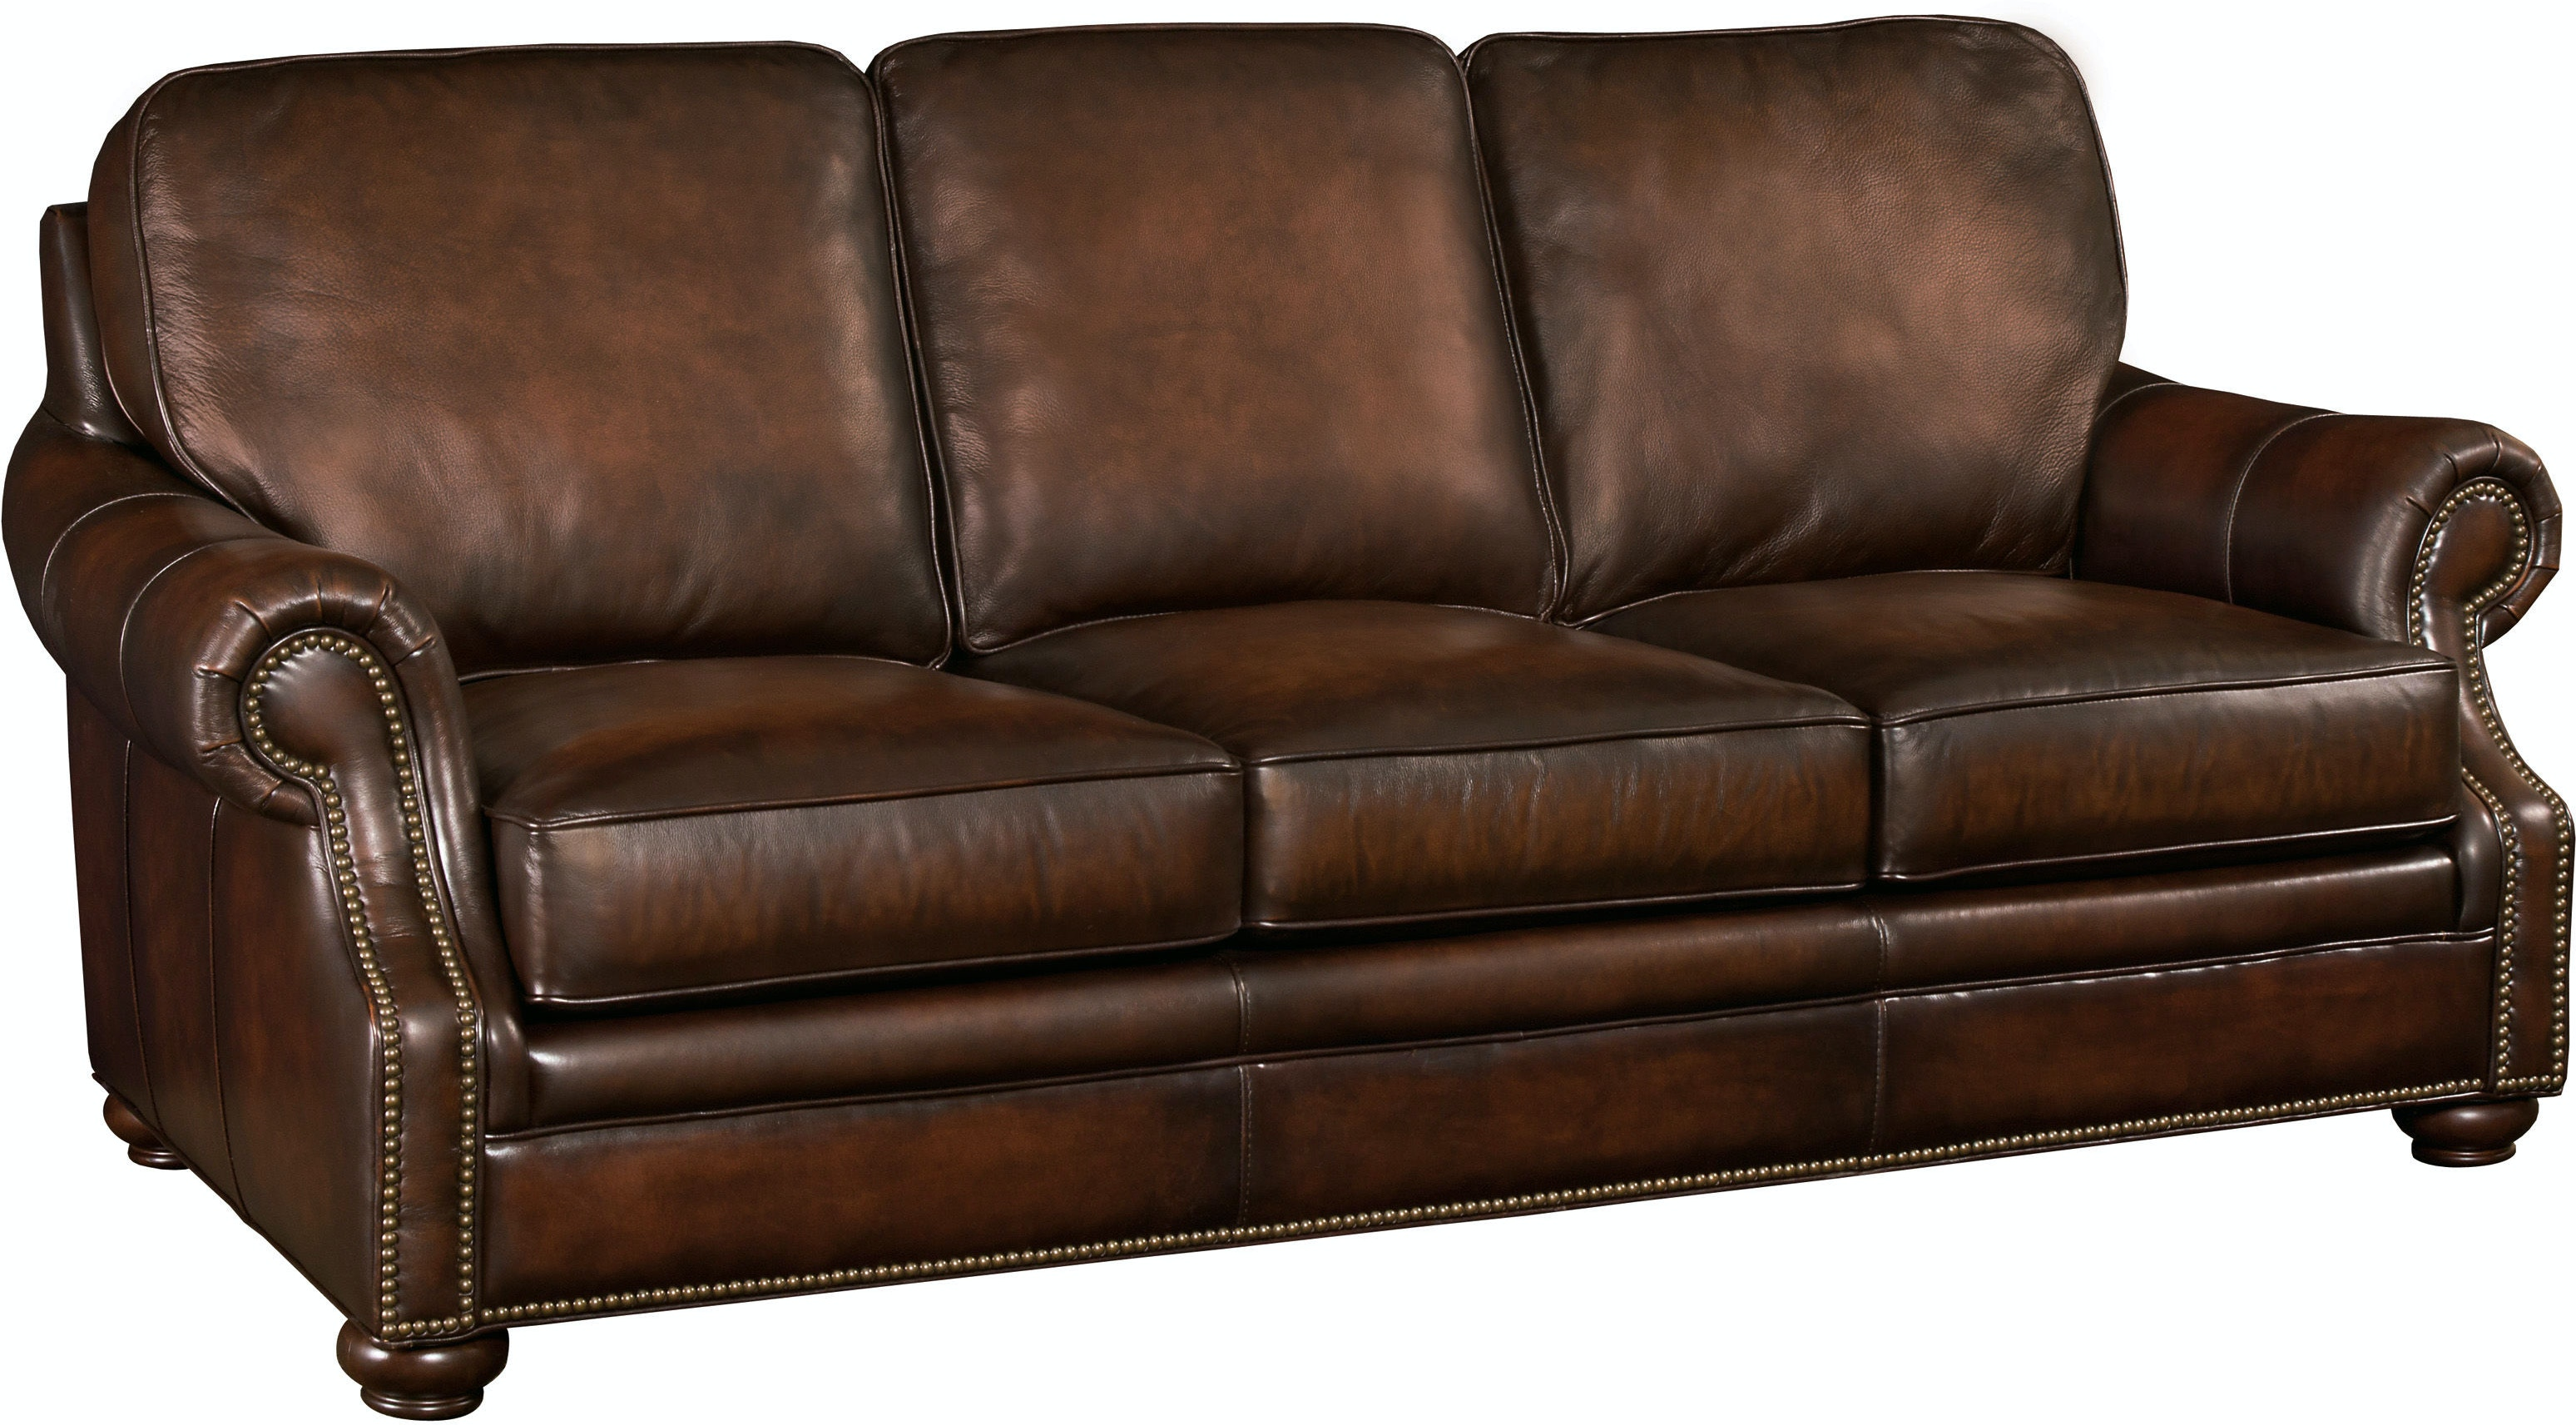 Superb Hooker Furniture Living Room Montgomery Sofa Ss185 03 089 Spiritservingveterans Wood Chair Design Ideas Spiritservingveteransorg